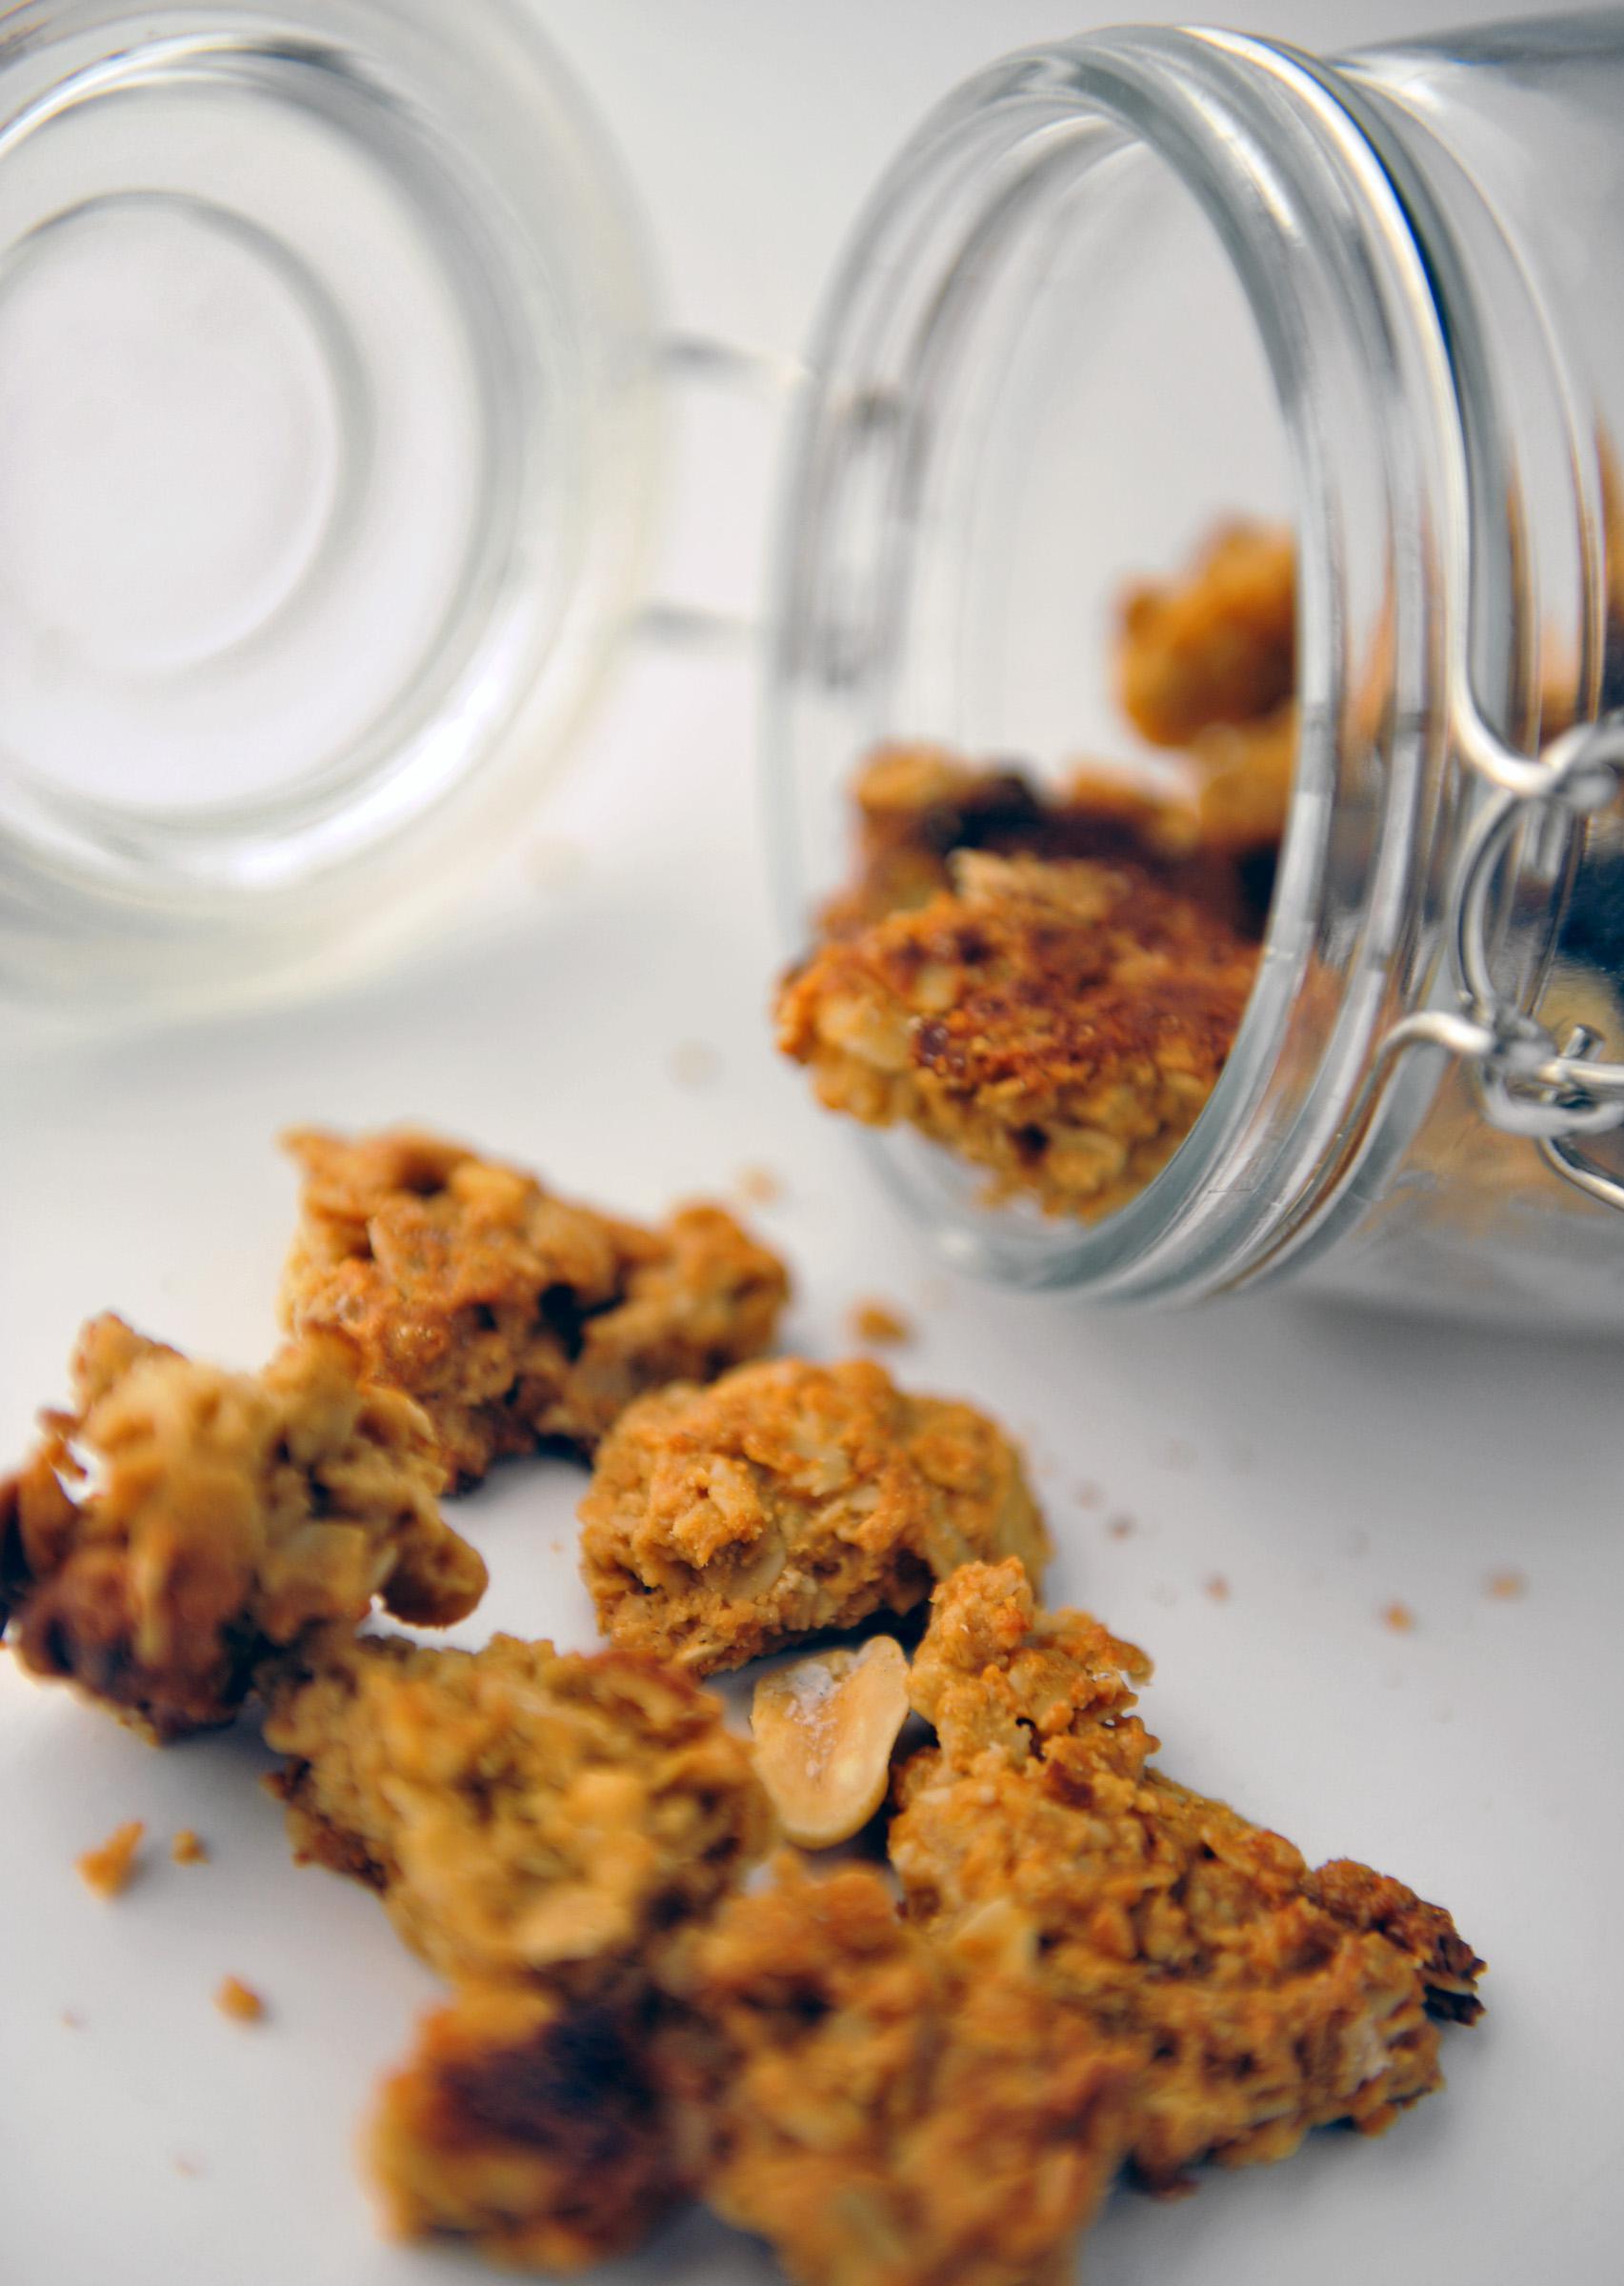 WASHINGTON DC - JANUARY 13: Peanut butter granola bars. (Photo b